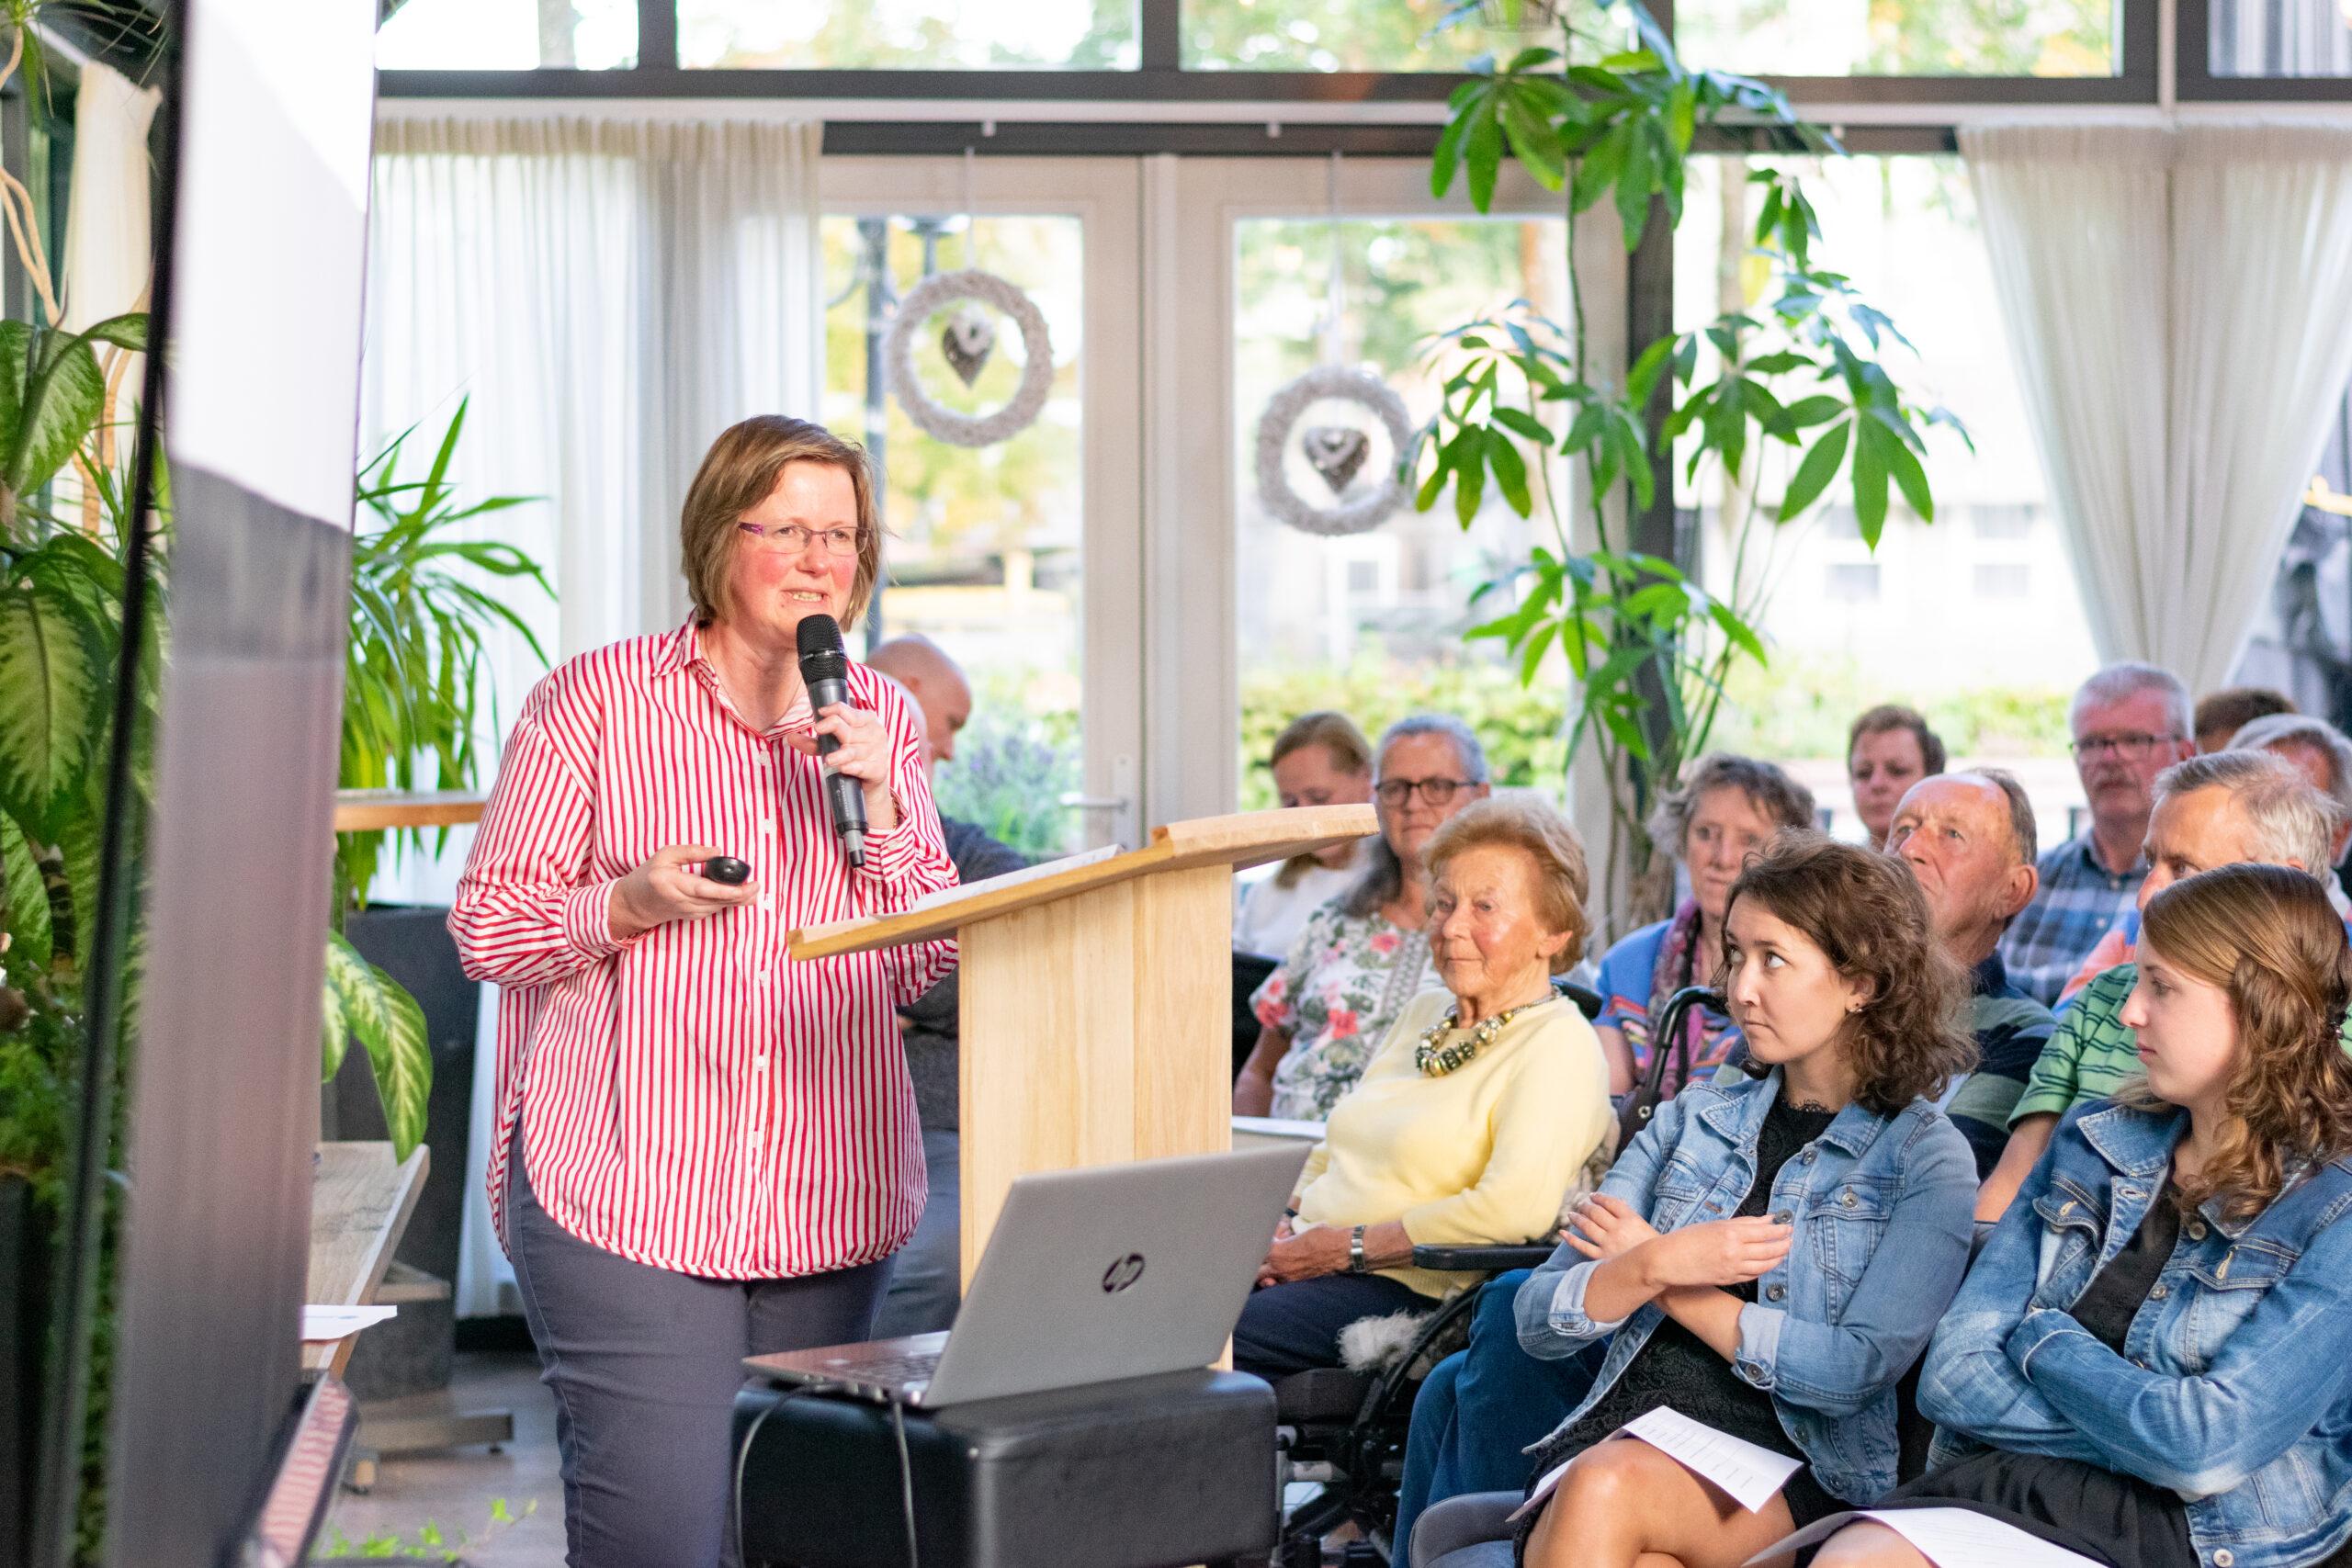 Spreker Diana Lewinski over werk en reuma